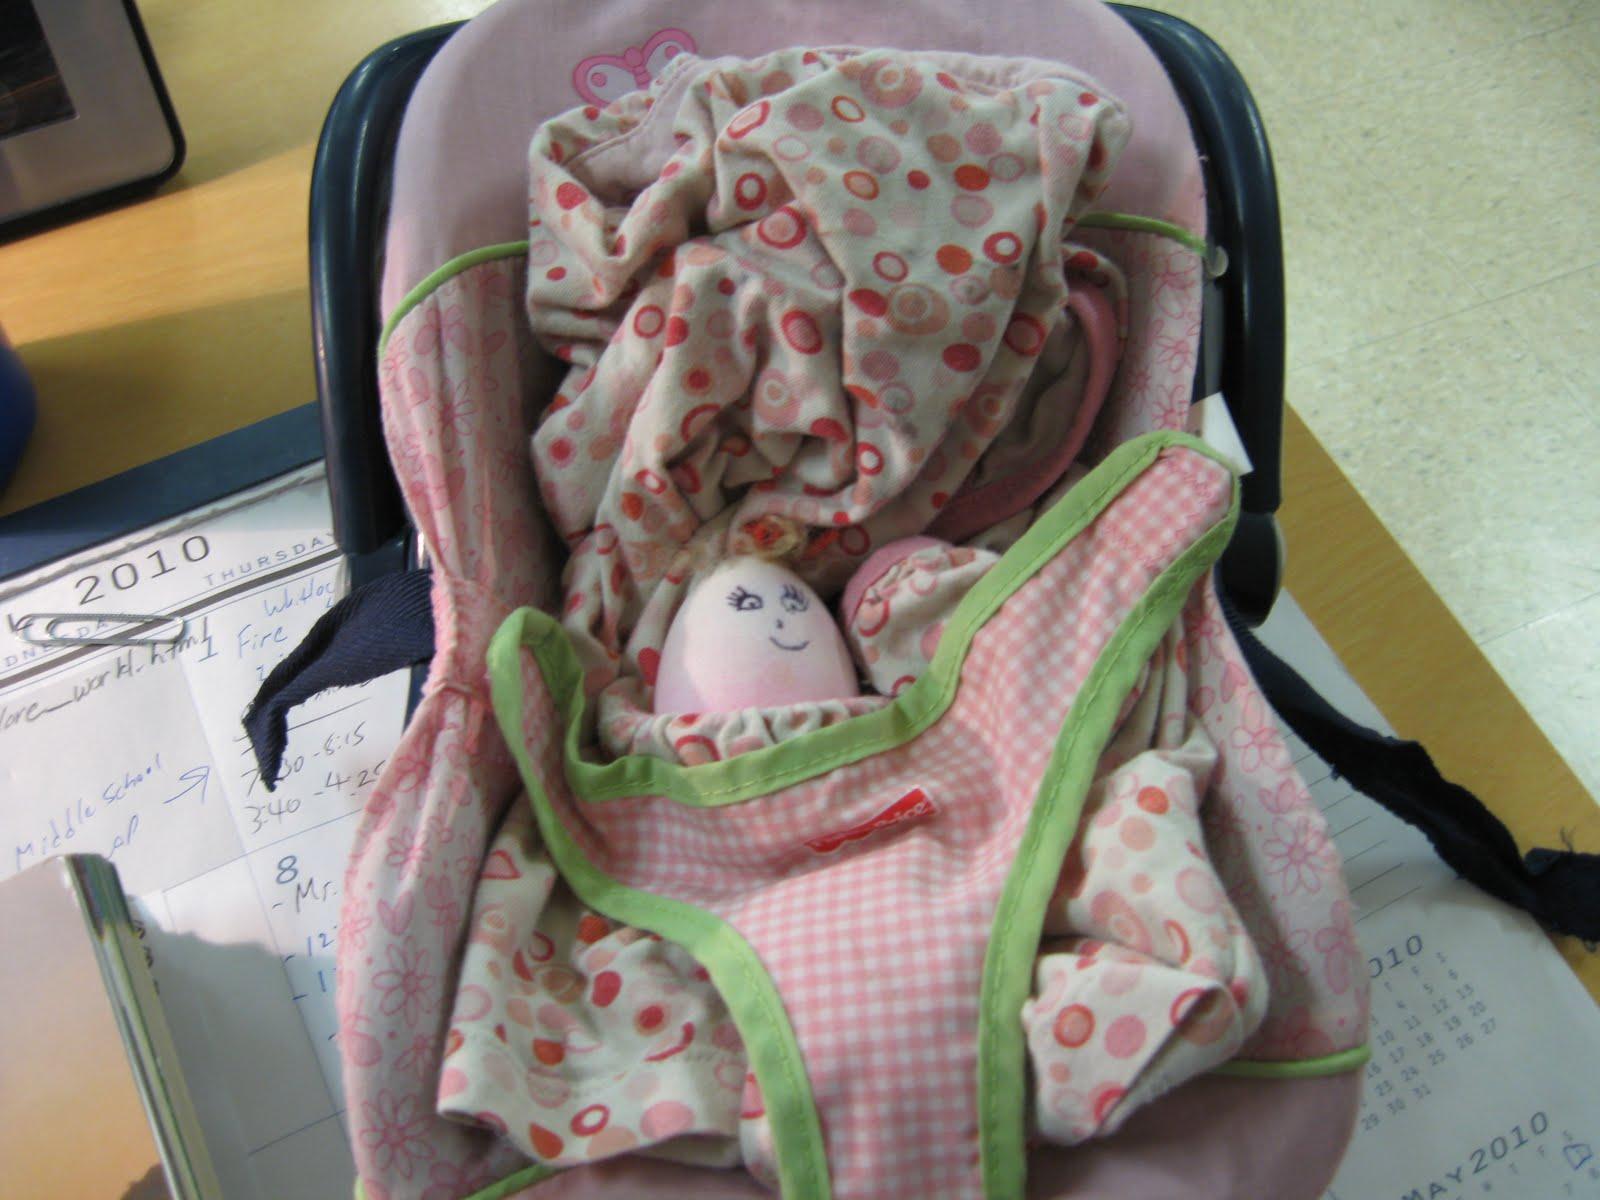 Egg Baby Carrie...